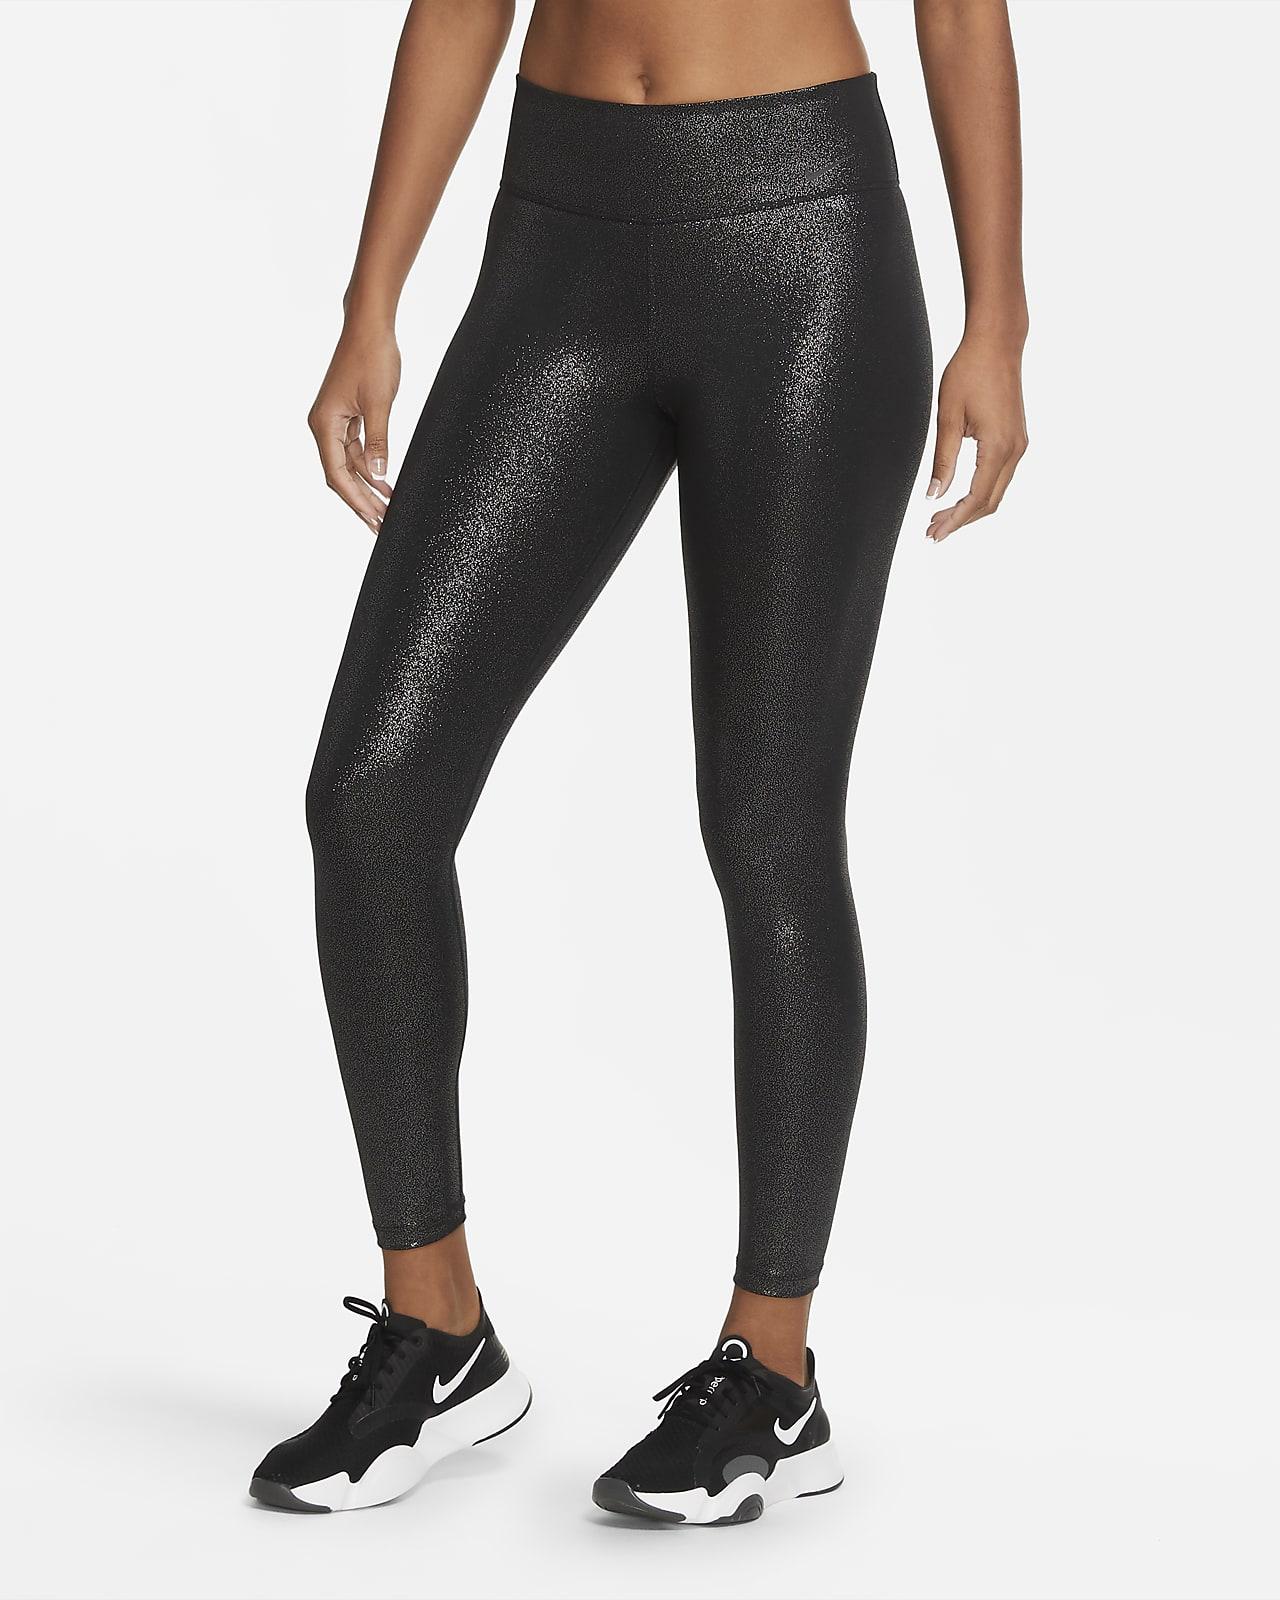 Legging 7/8 scintillant Nike One pour Femme